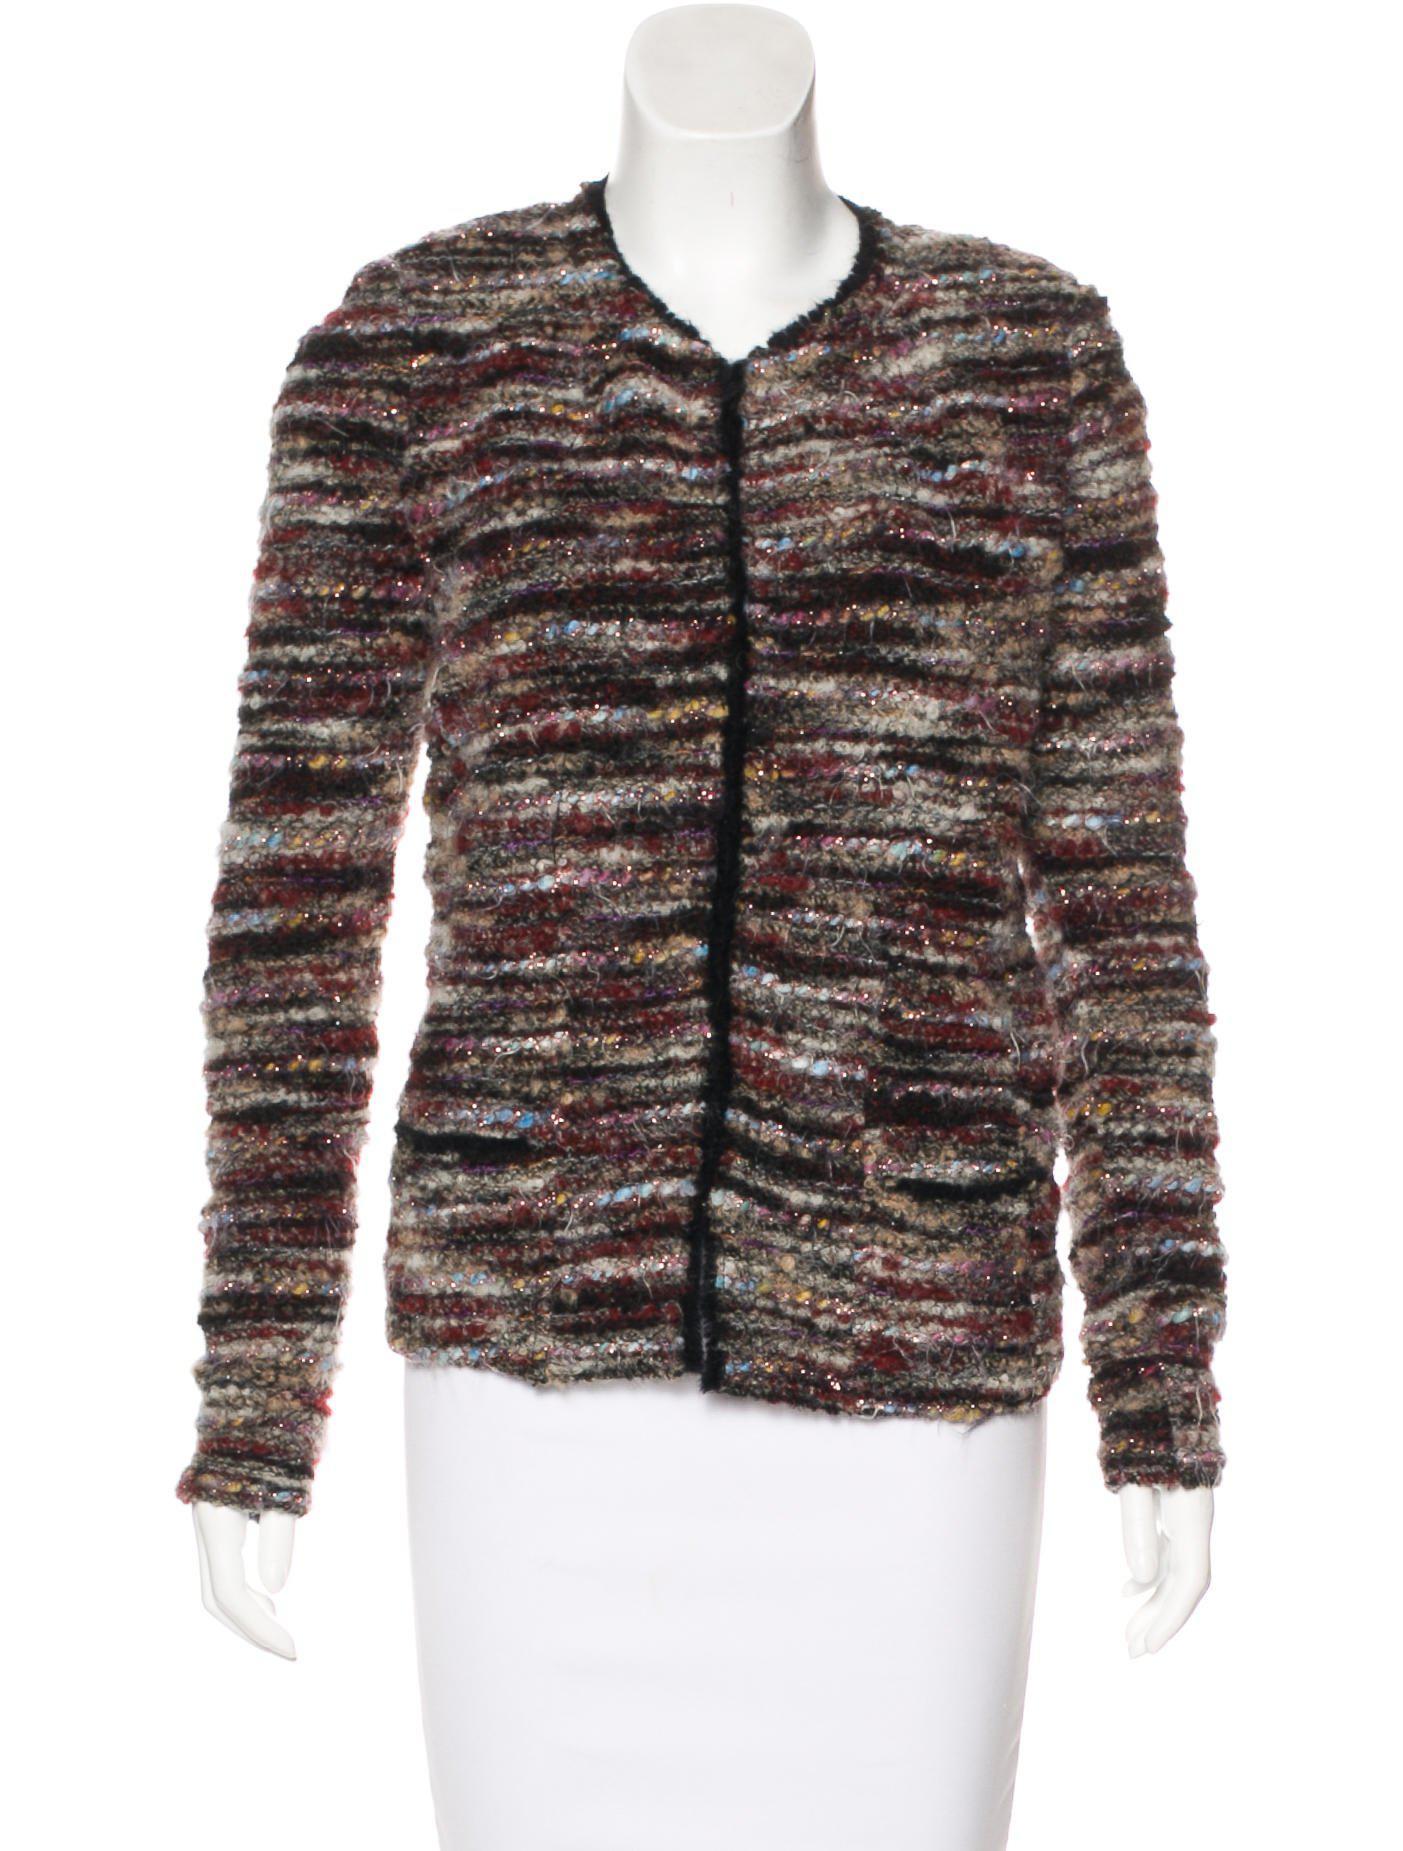 Websites Sale Online Isabel Marant Wool-Blend Bouclé Jacket Factory Outlet 100% Guaranteed Sale Online Discount Geniue Stockist 2GZUG